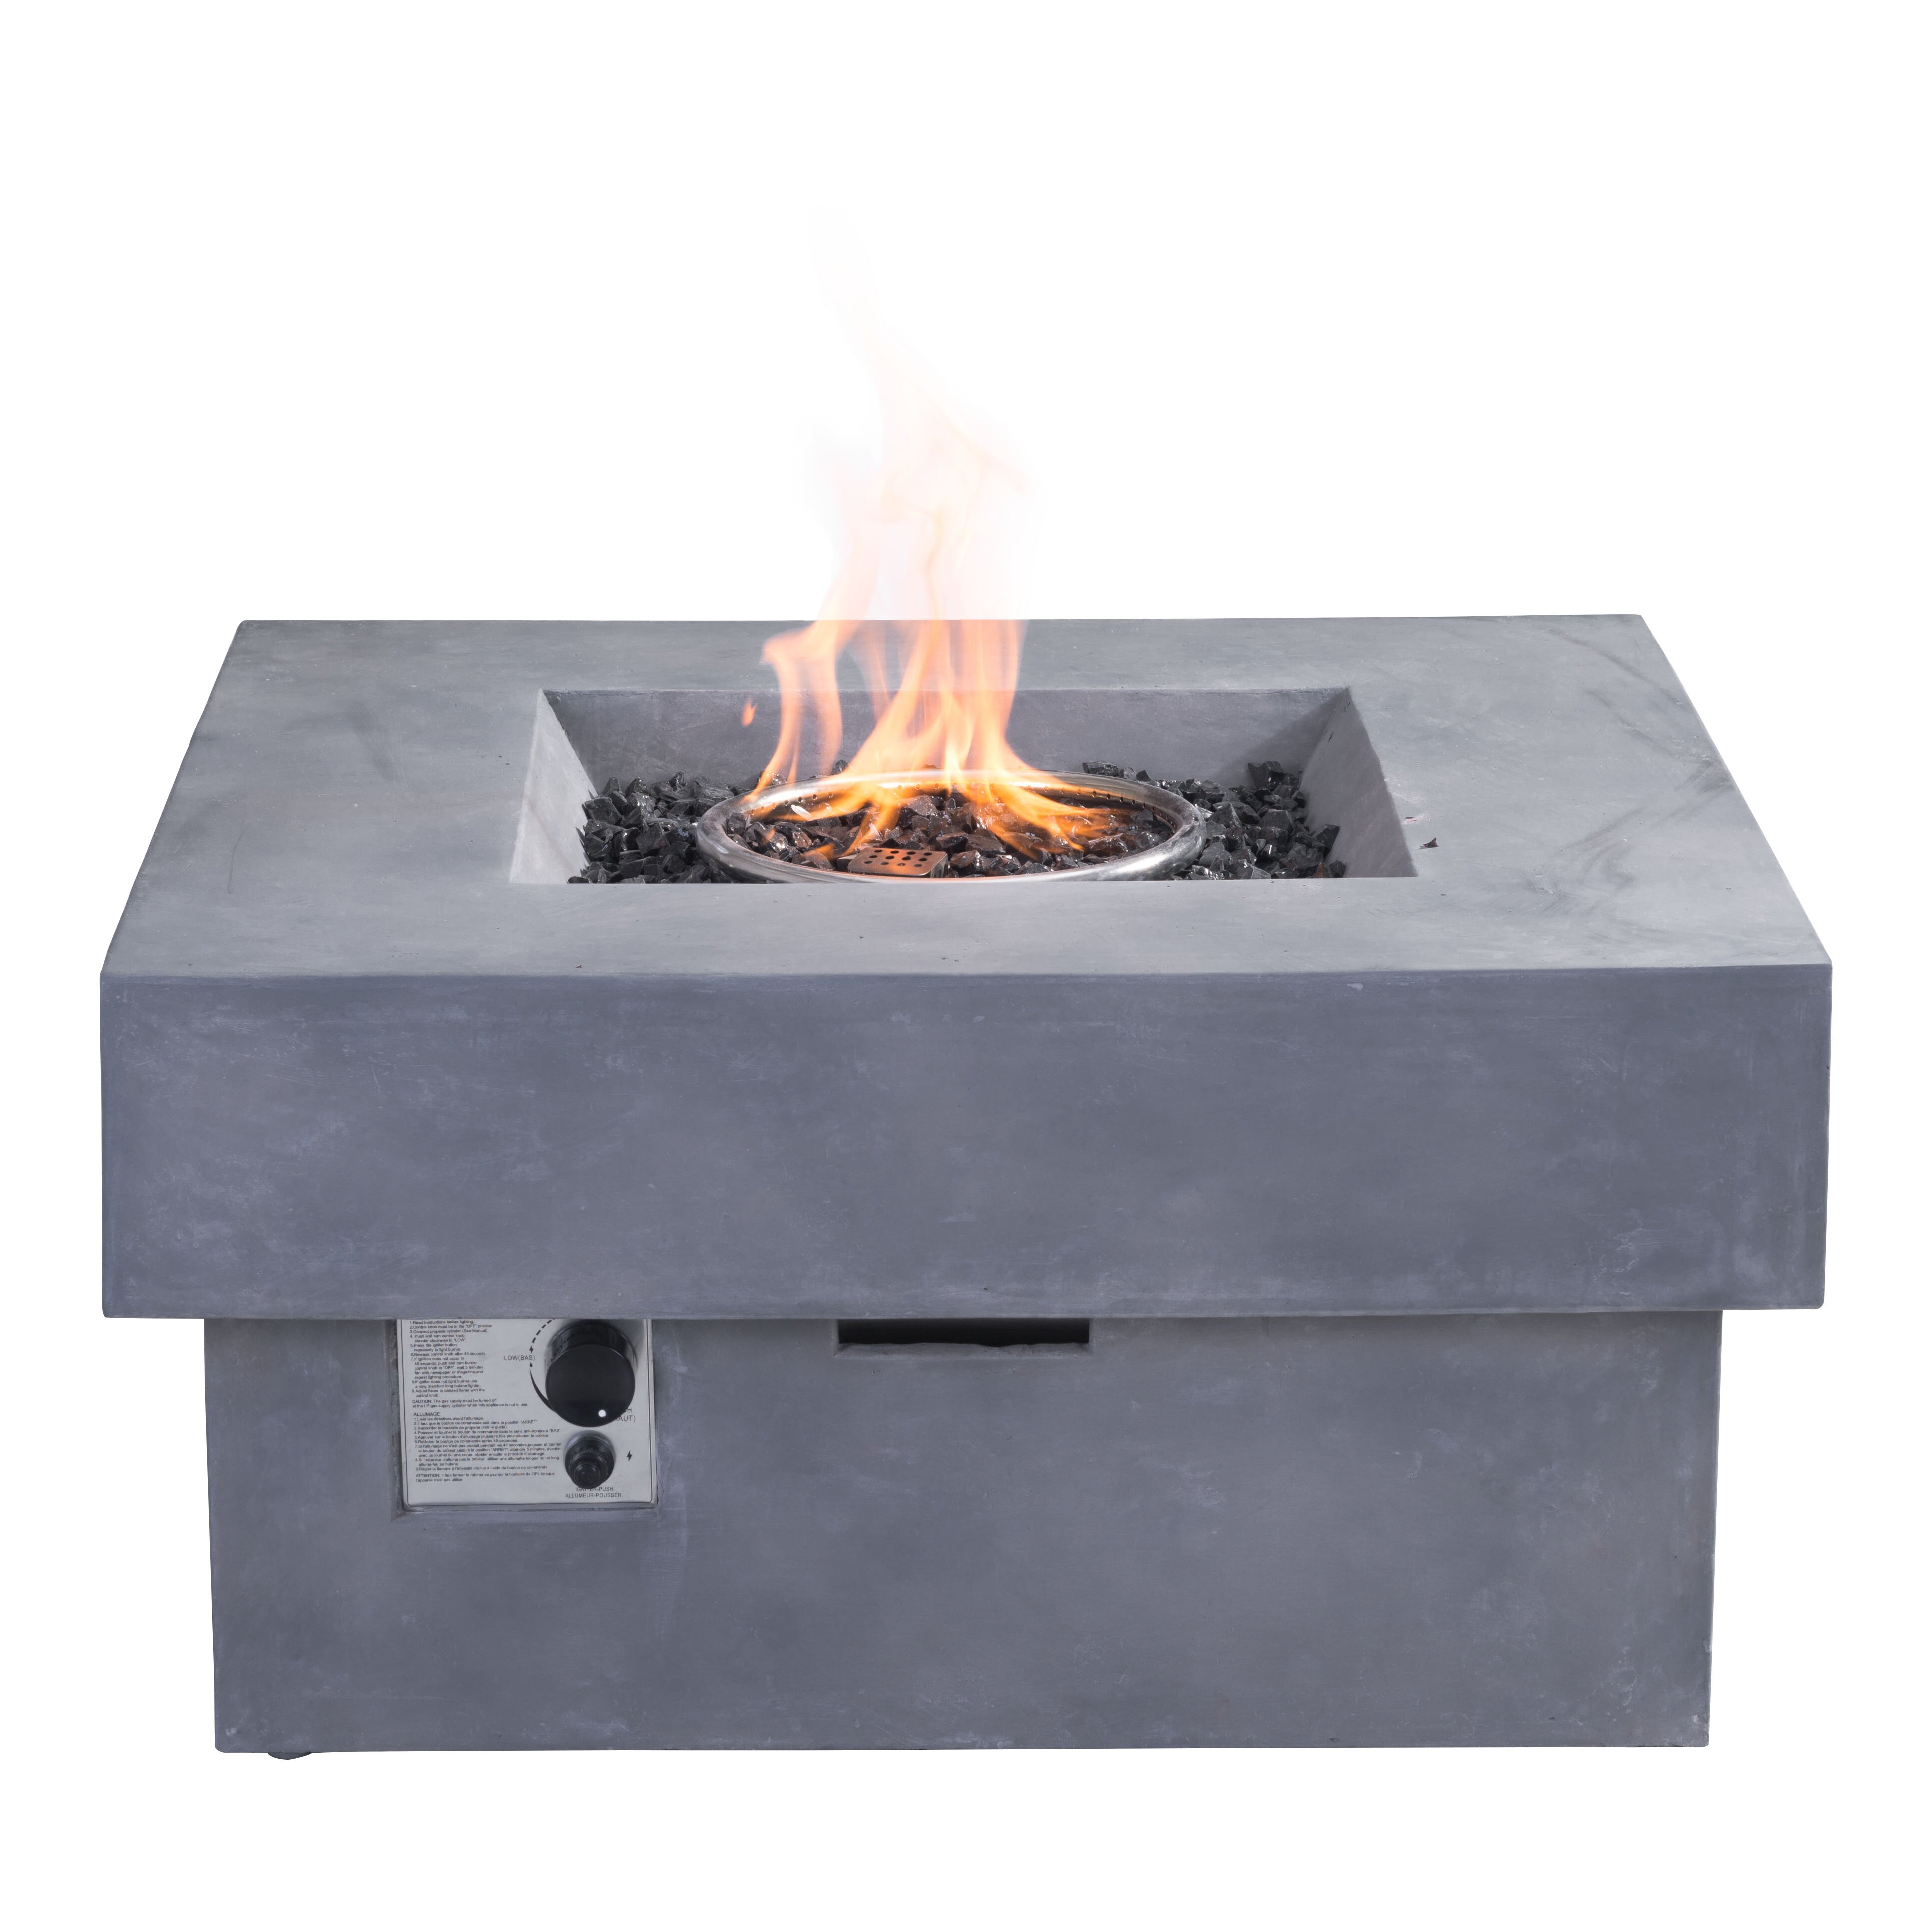 dCOR design Concrete Fibre Propane Fire Pit Table  : dCOR design Concrete Fibre Propane Fire Pit Table from www.wayfair.ca size 3867 x 3867 jpeg 907kB